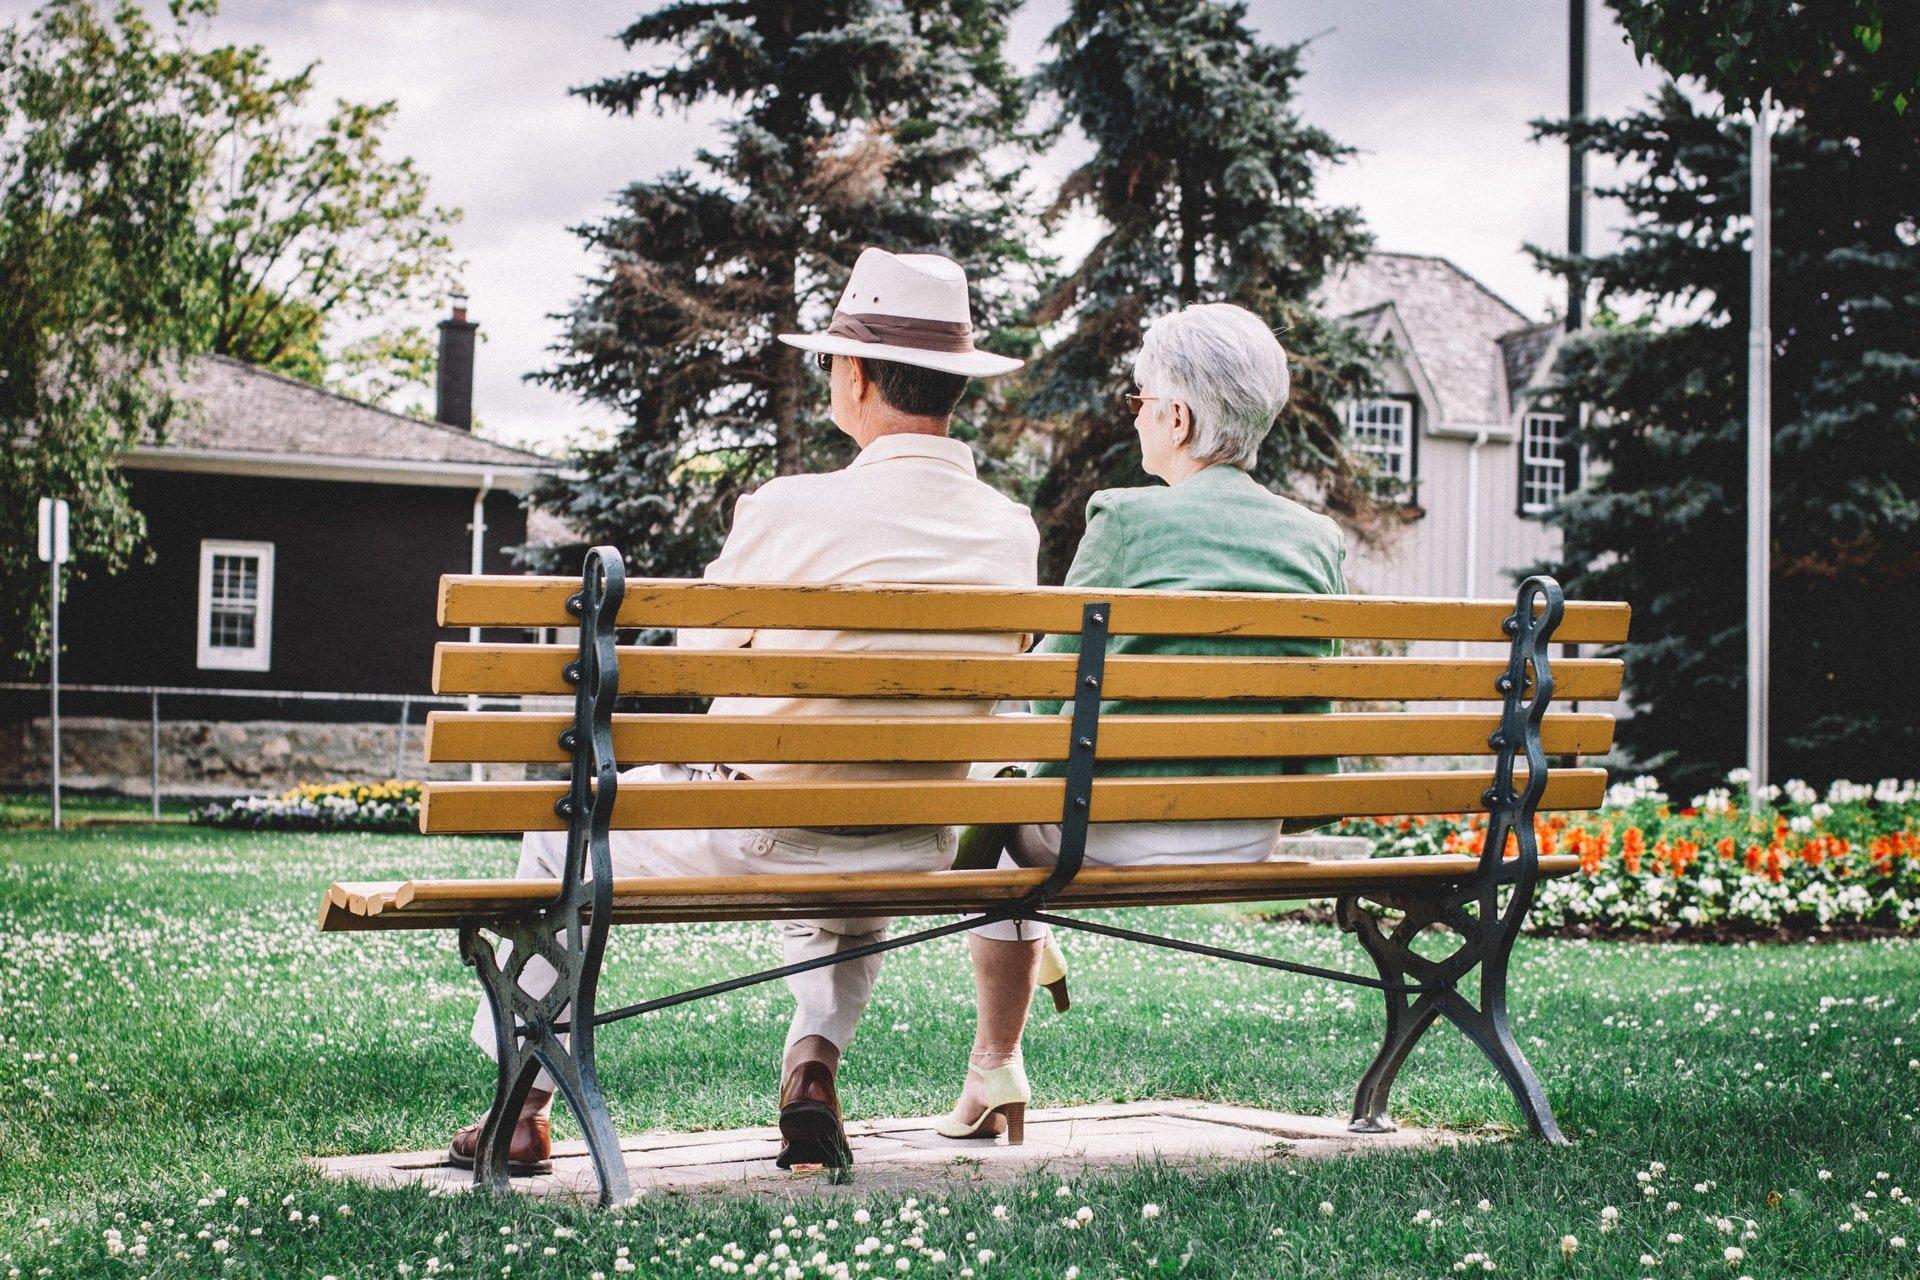 Elderly couple sitting on a bench   Source: Unsplash